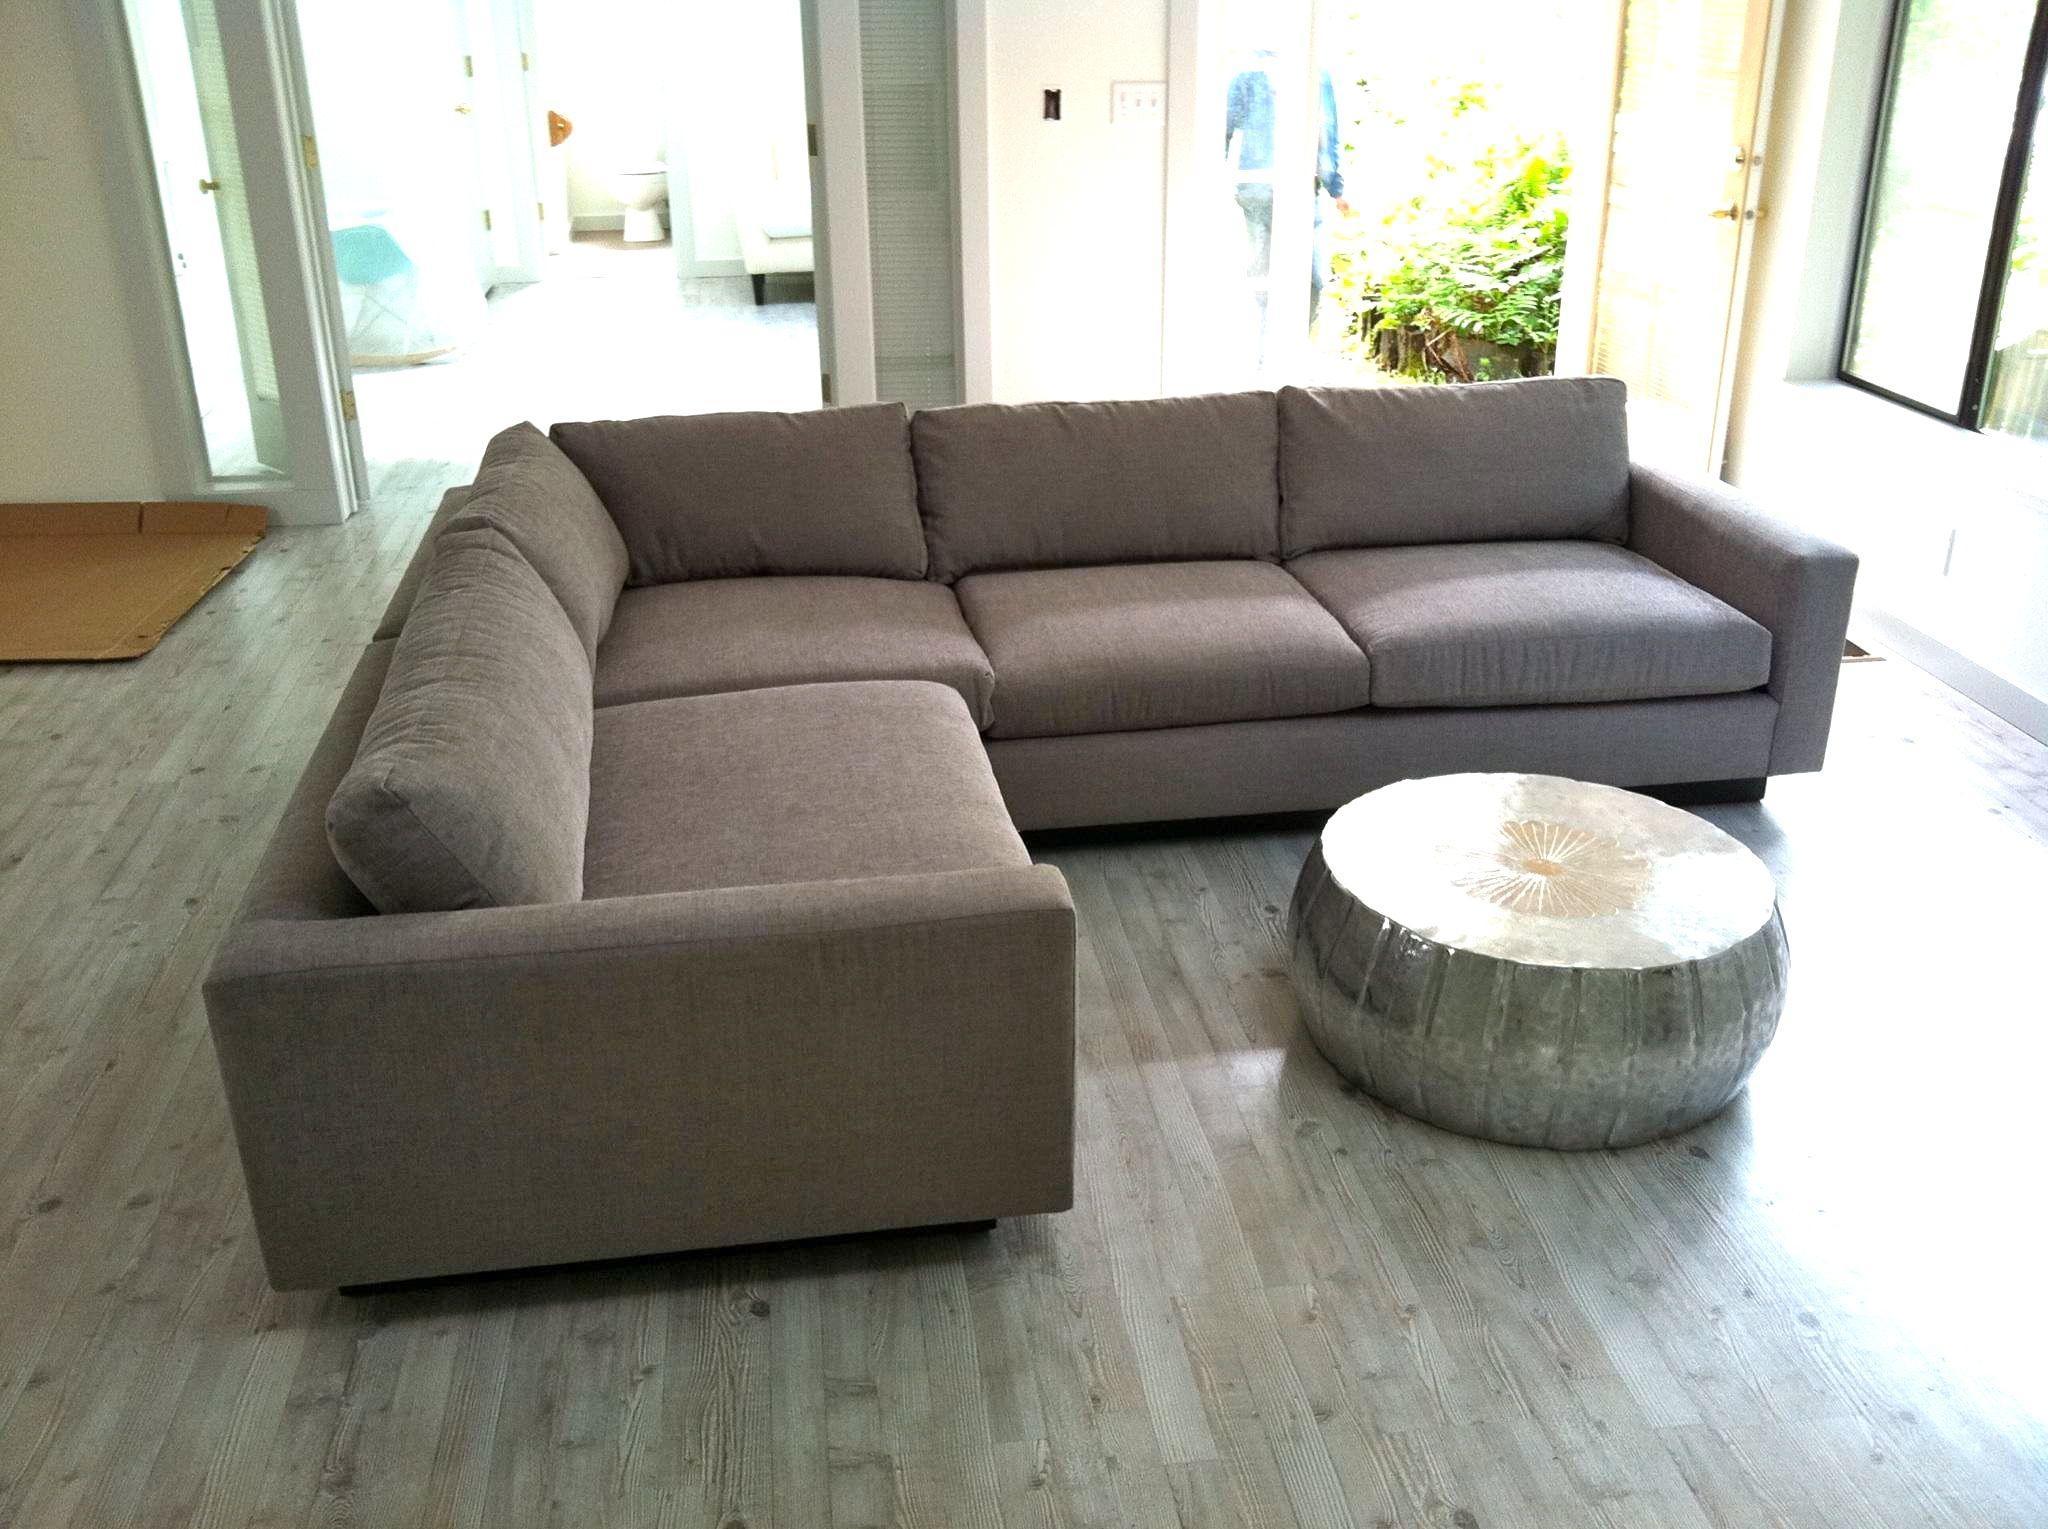 15 Best Ideas Deep Seat Leather Sectional  Sofa Ideas